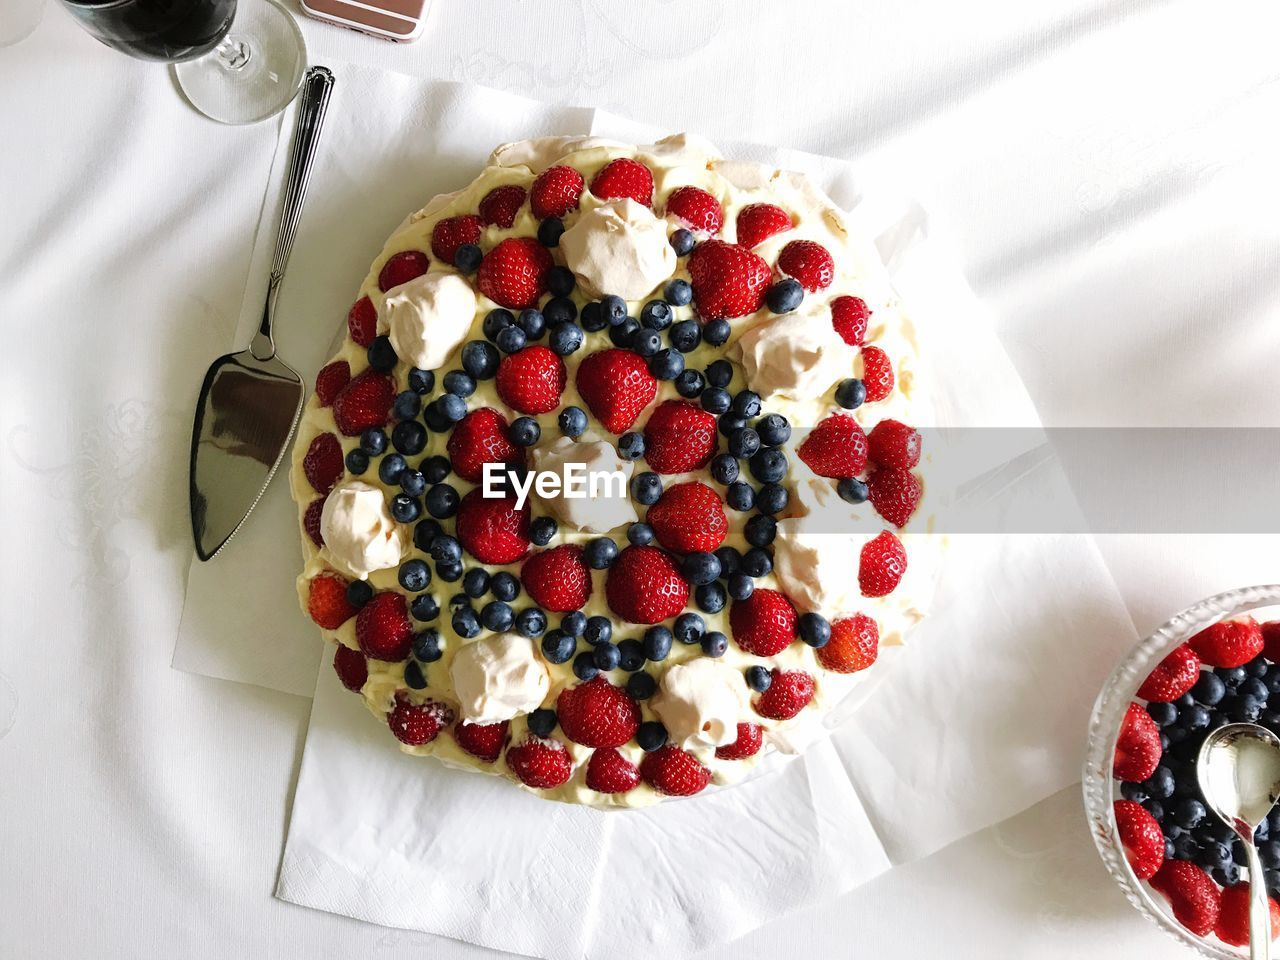 High angle view of cake on tablecloth